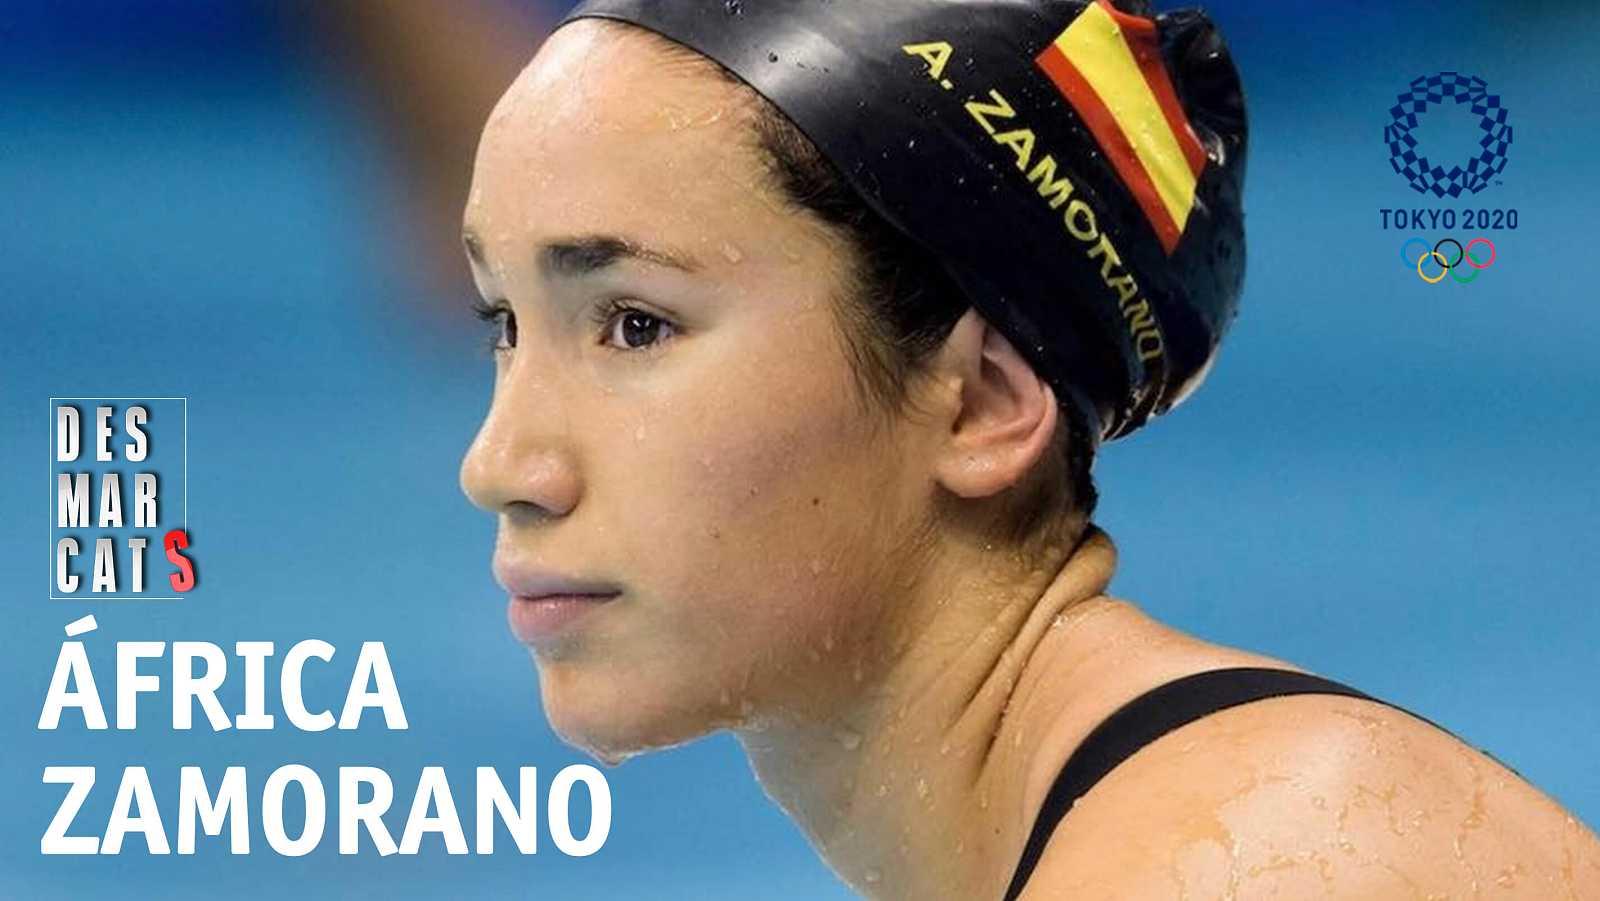 Desmarcats - África Zamorano, nedadora olímpica del CN Sant Andreu